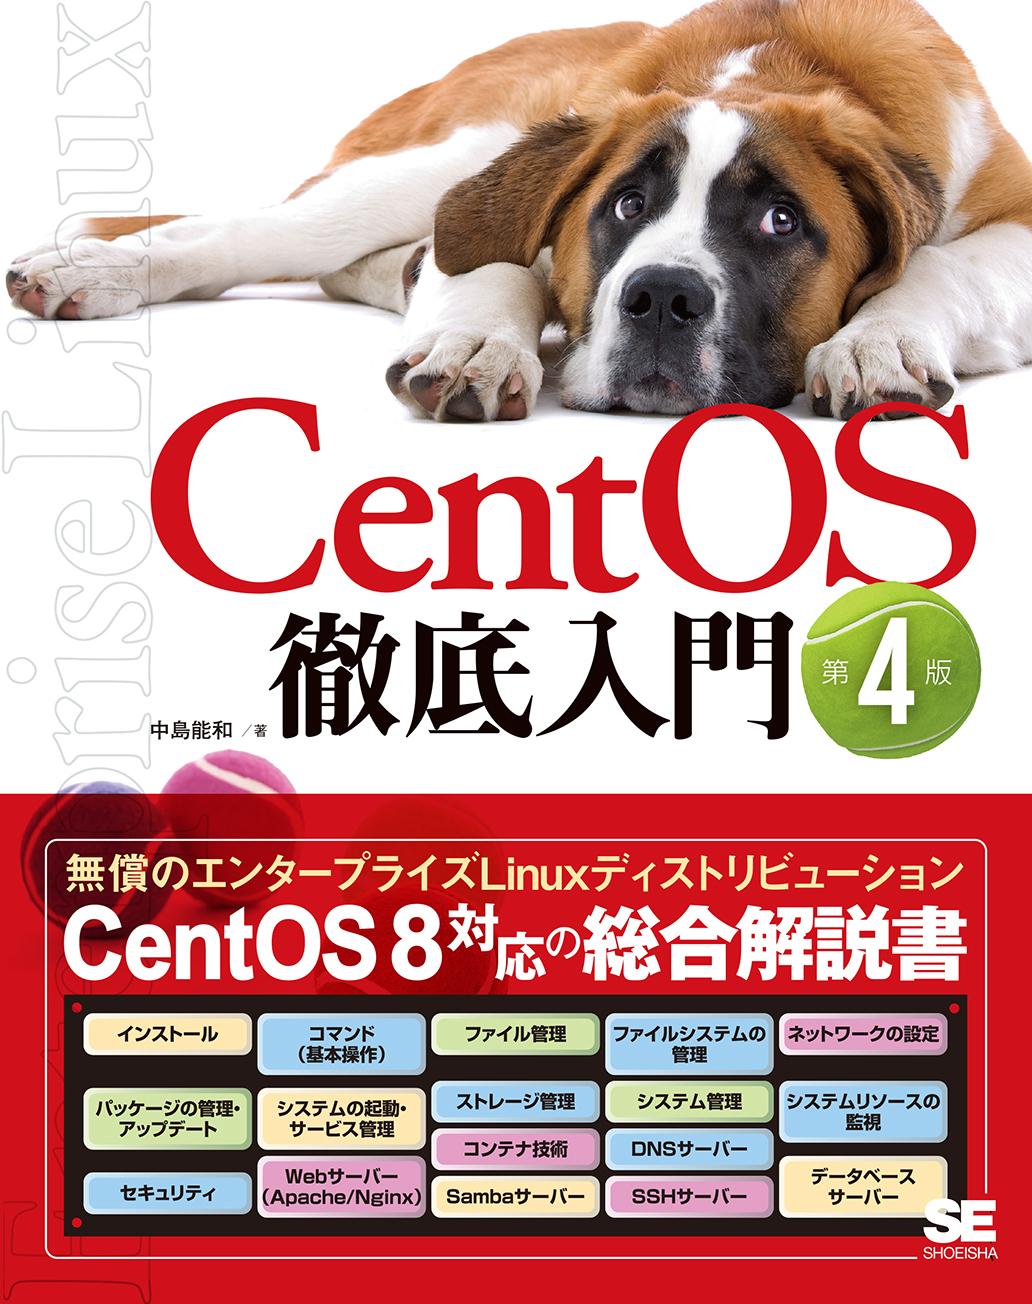 CentOS徹底入門 第4版(翔泳社)